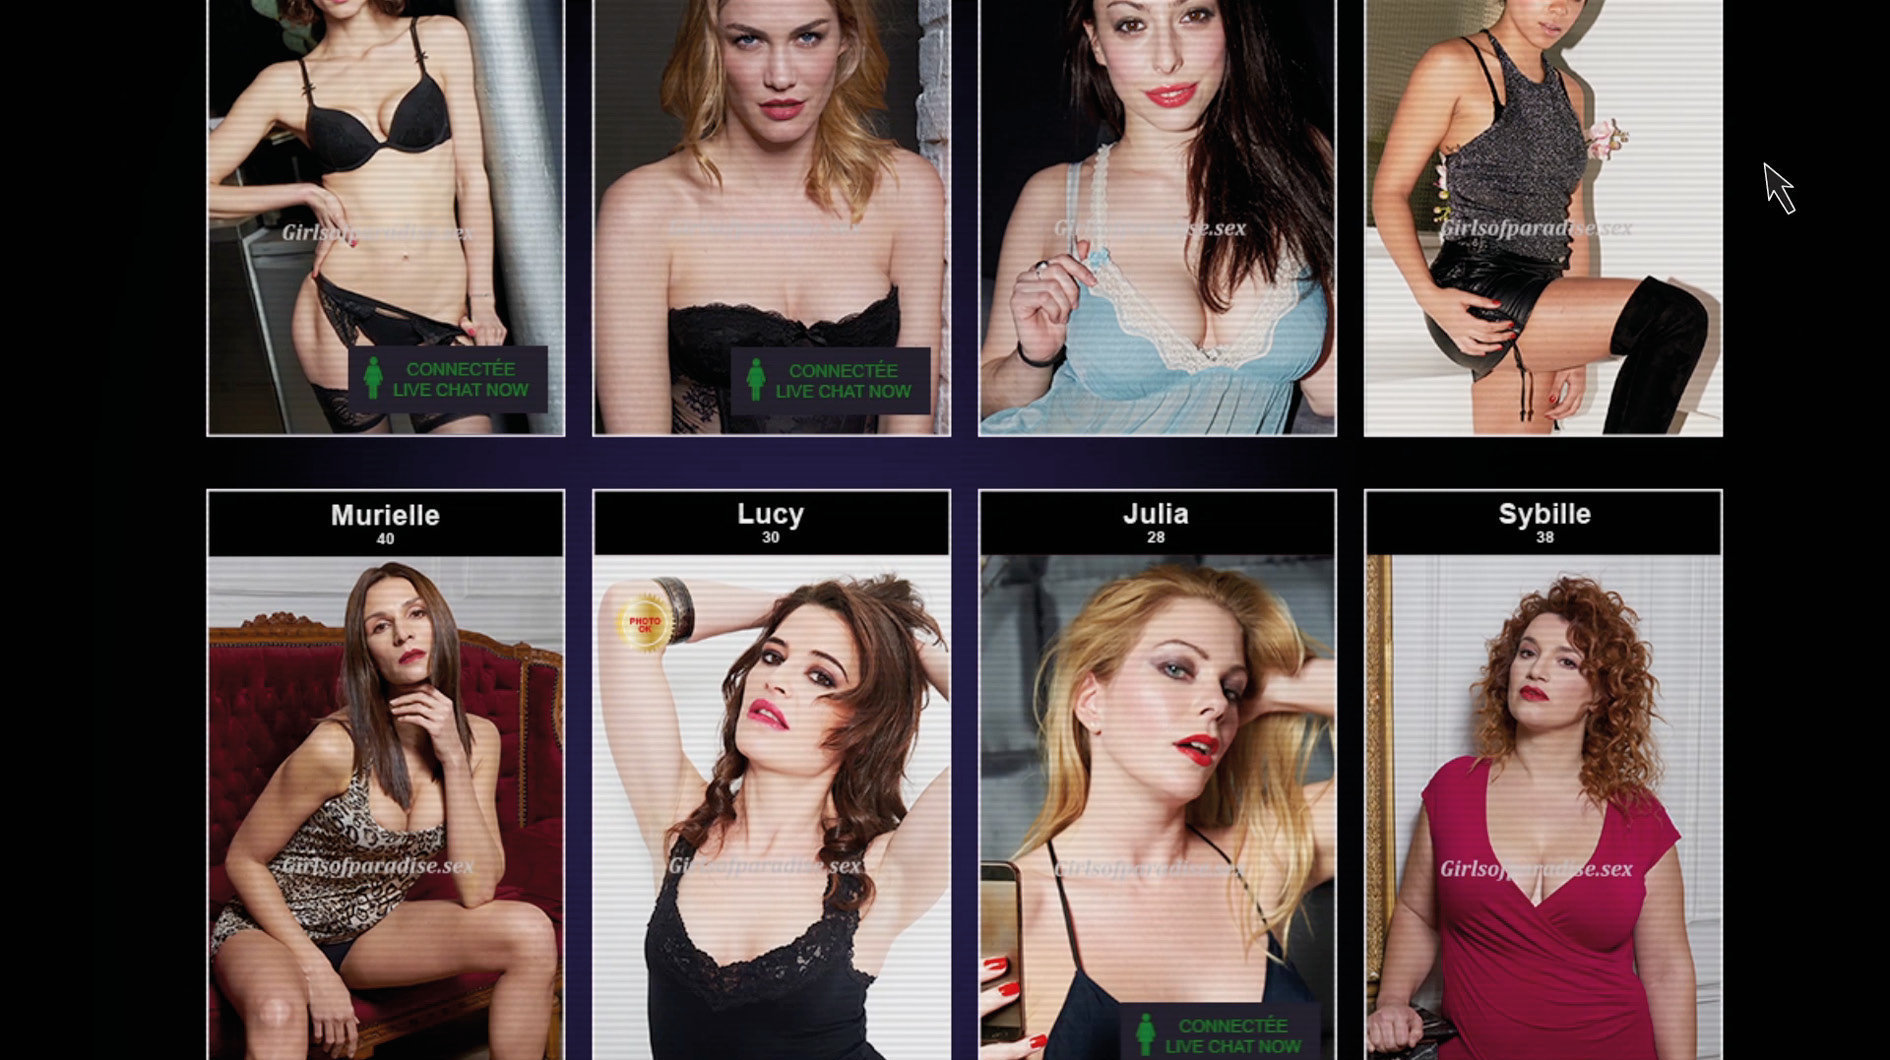 paginas para contratar prostitutas prostitutas en the witcher